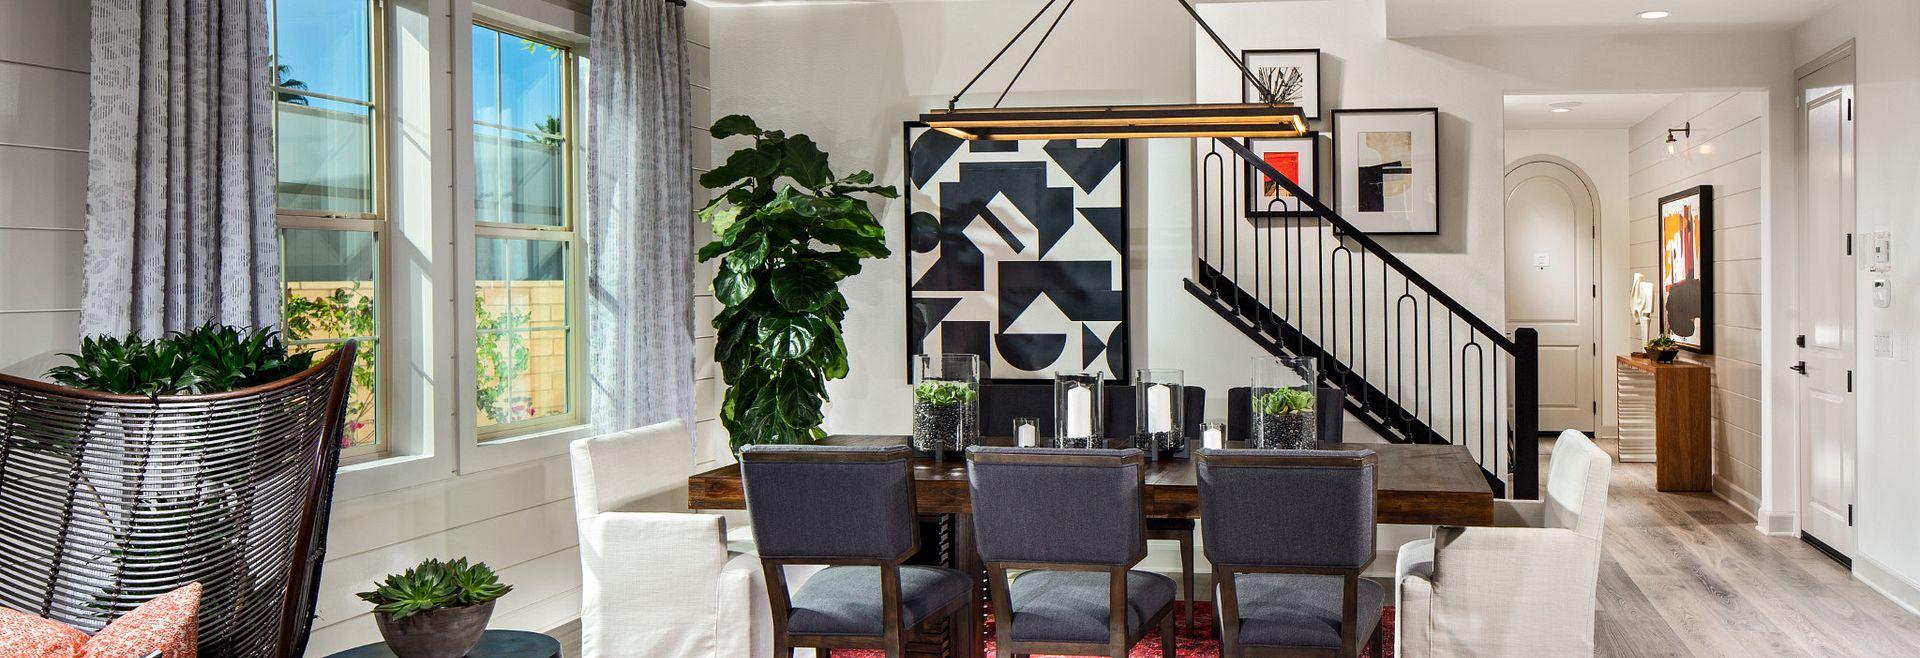 Residence 2 Dining Room